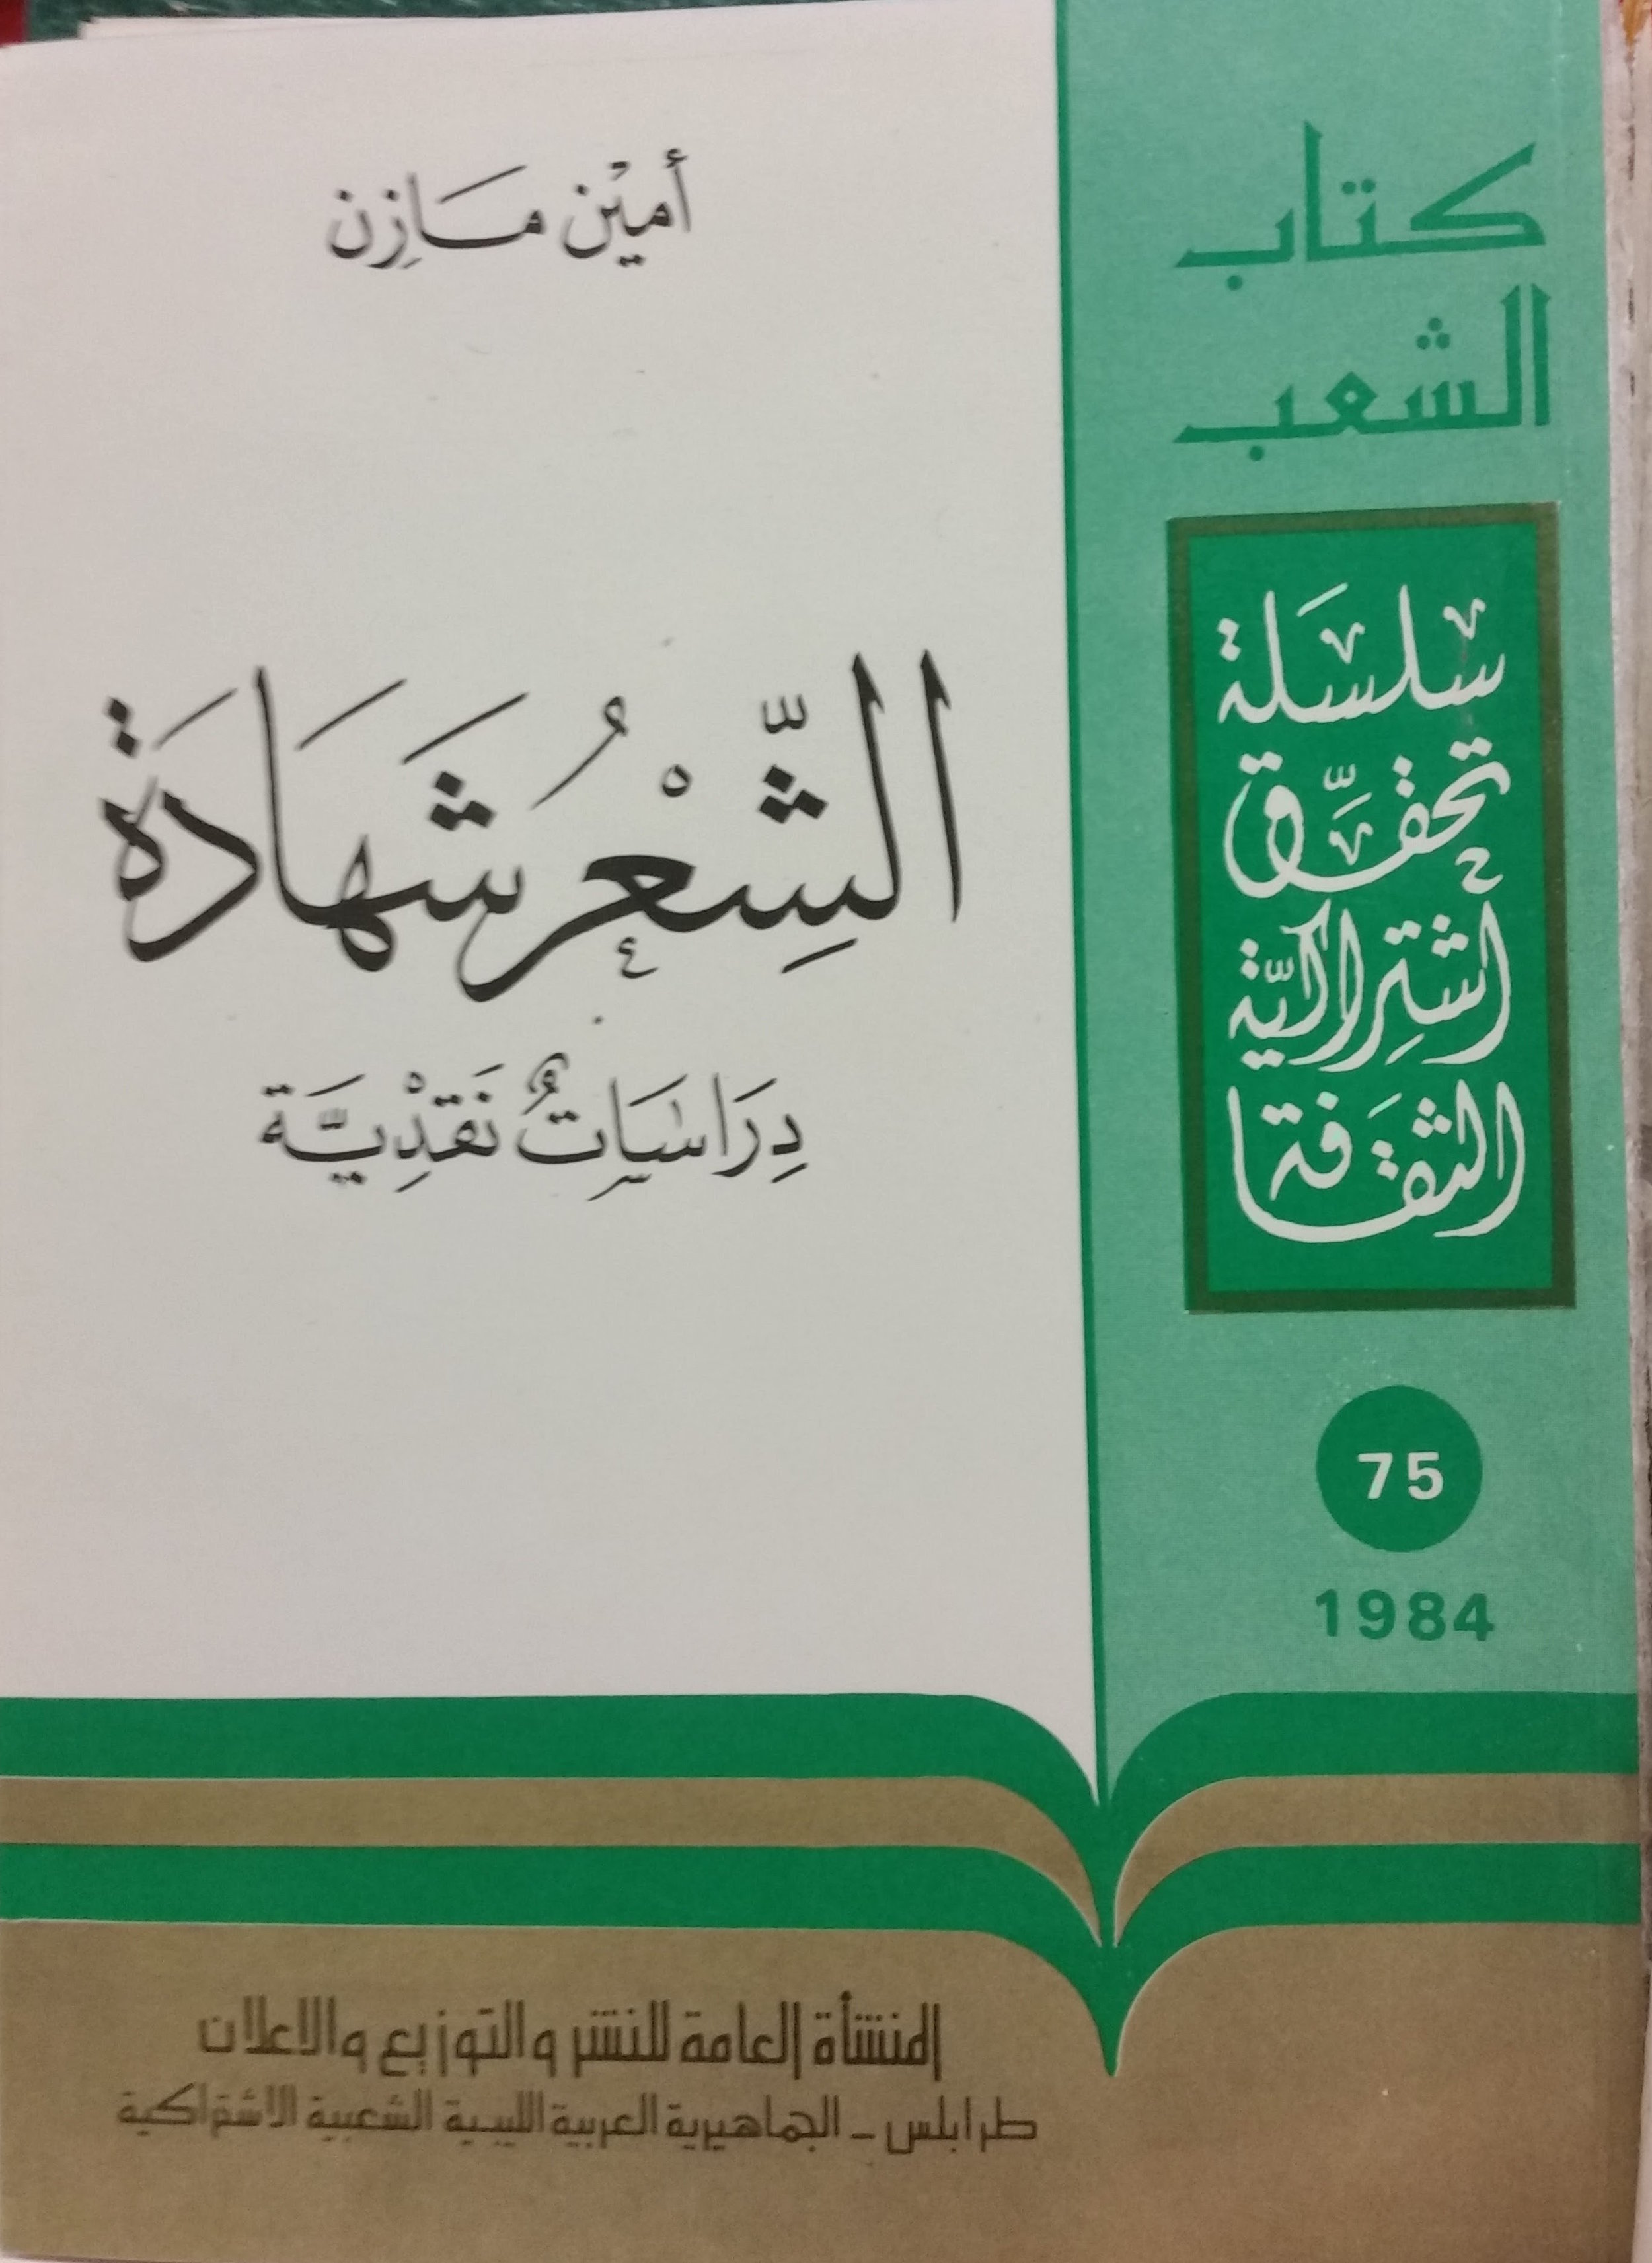 Amīn Māzin (Ṭarābulus, al-Jamāhīrīyah al-ʻArabīyah al-Lībiyyah al-Shaʻbiyyah al-Ishtirākiyyah : al-Munsha'ah al-ʻĀmmah, 1984)